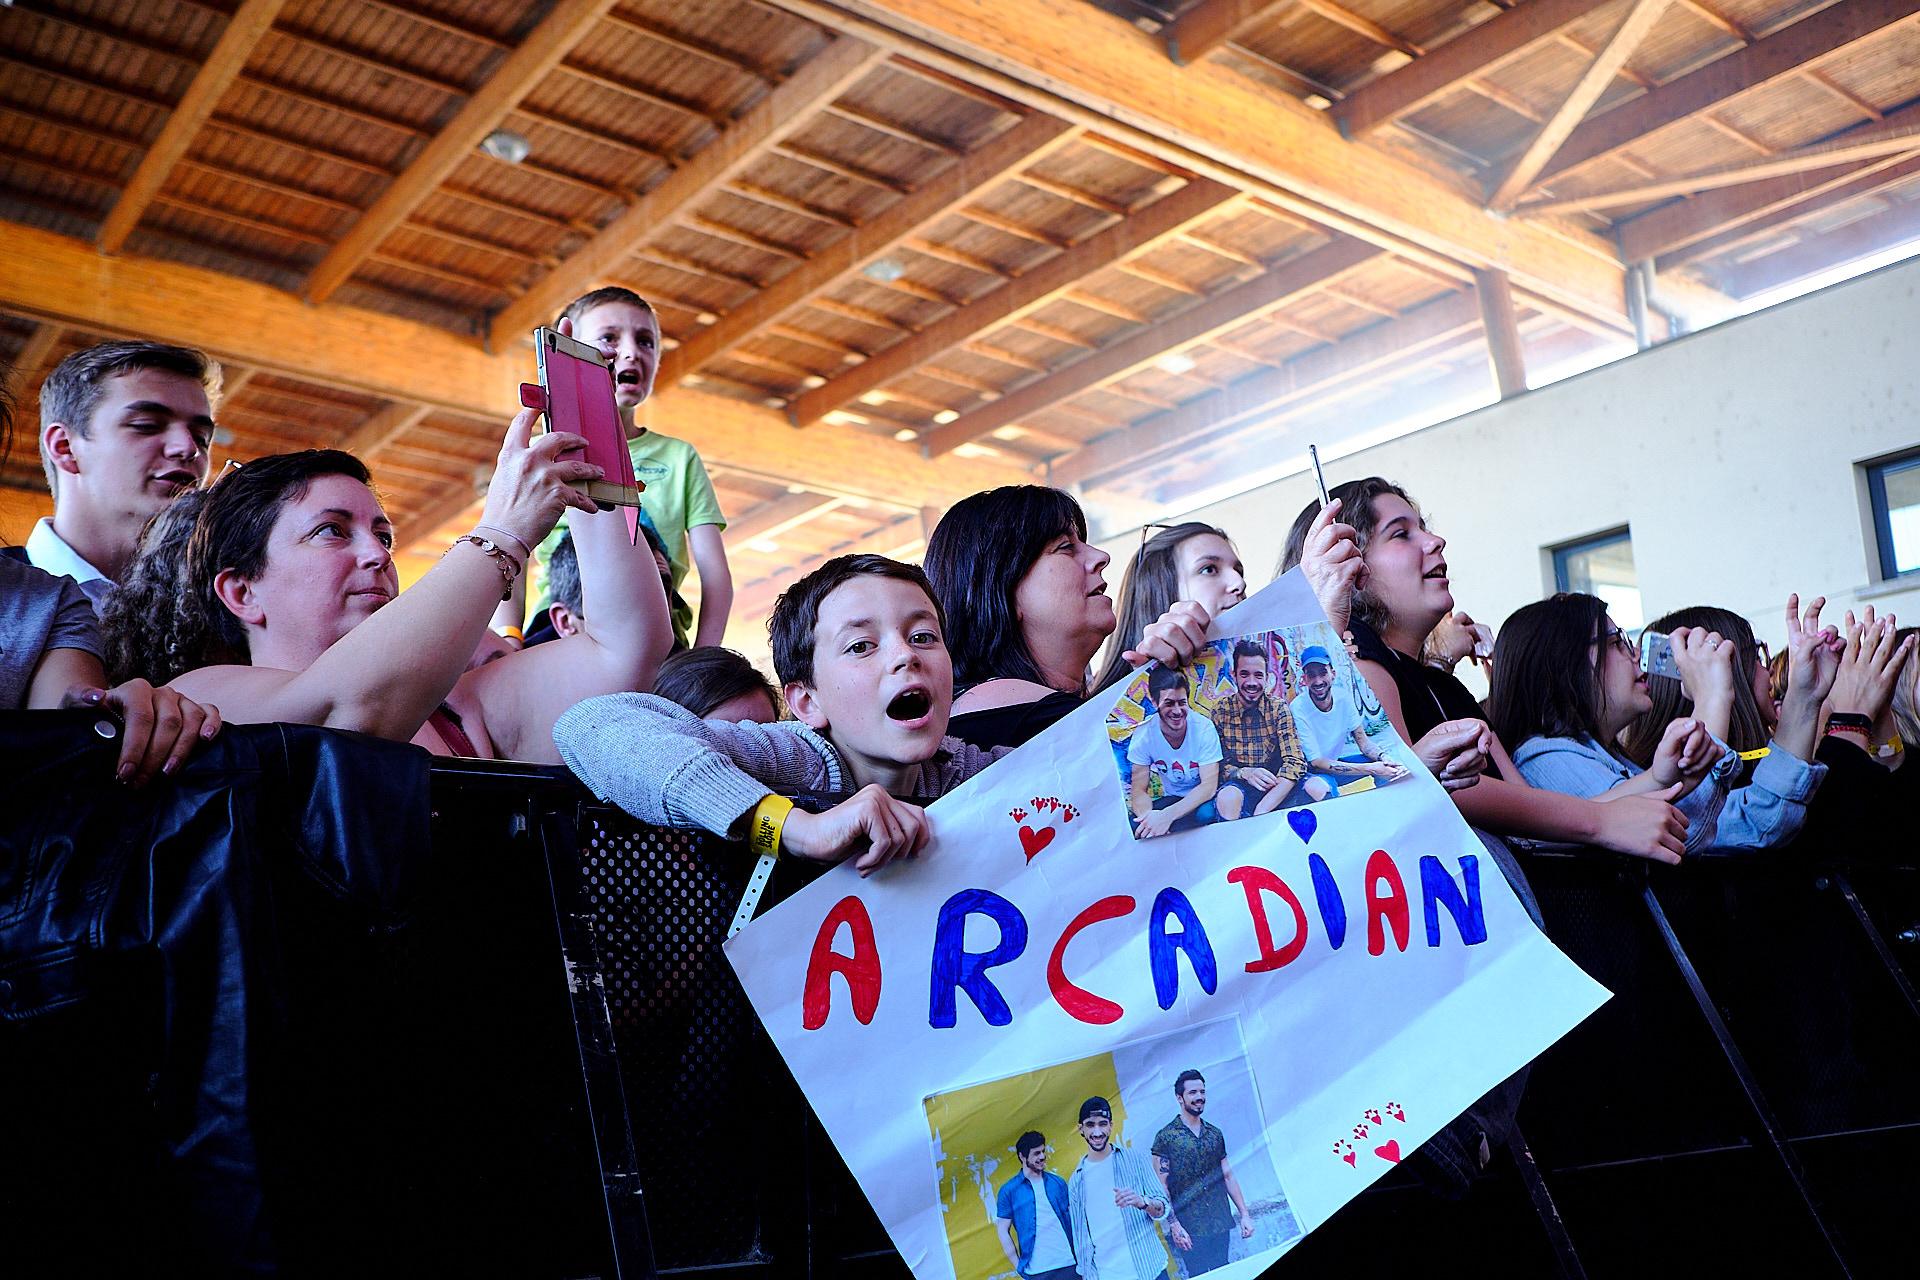 ARCADIAN_011